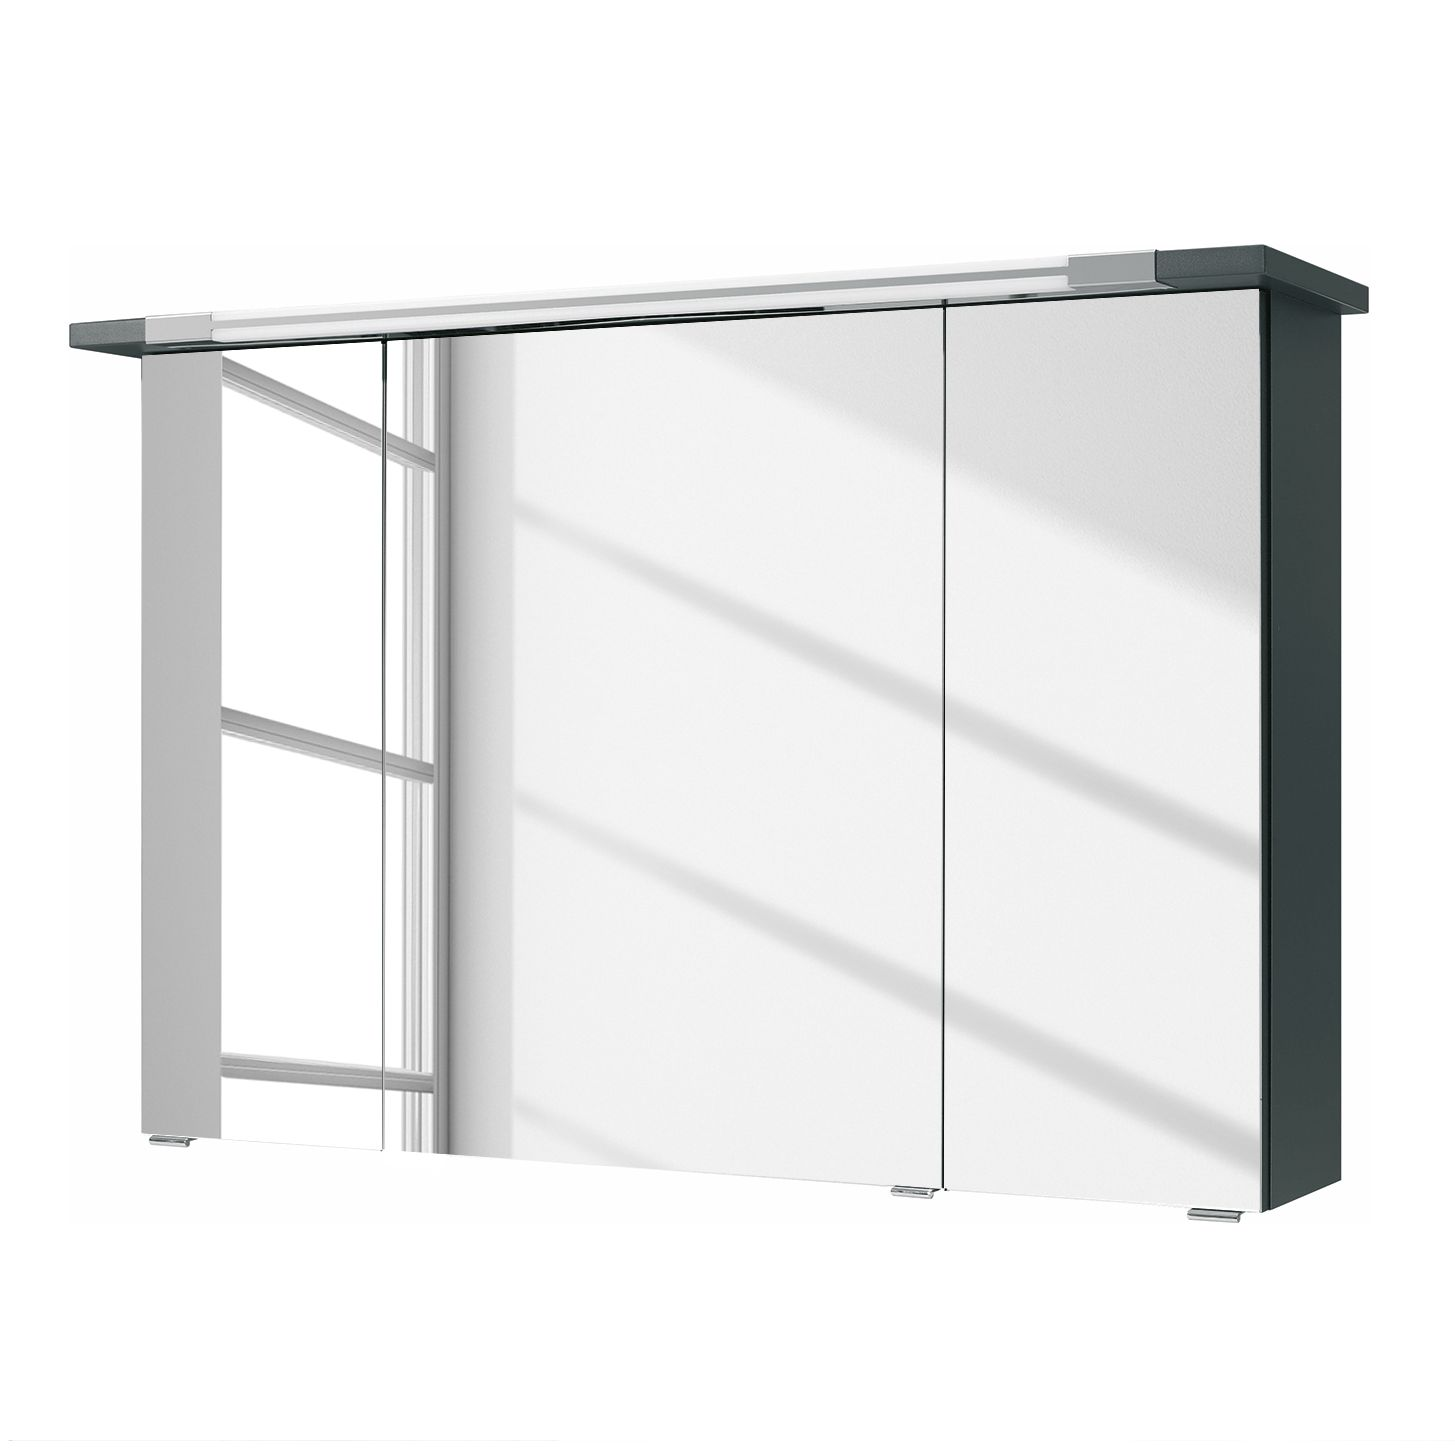 Spiegelschrank Java Grey, Pelipal